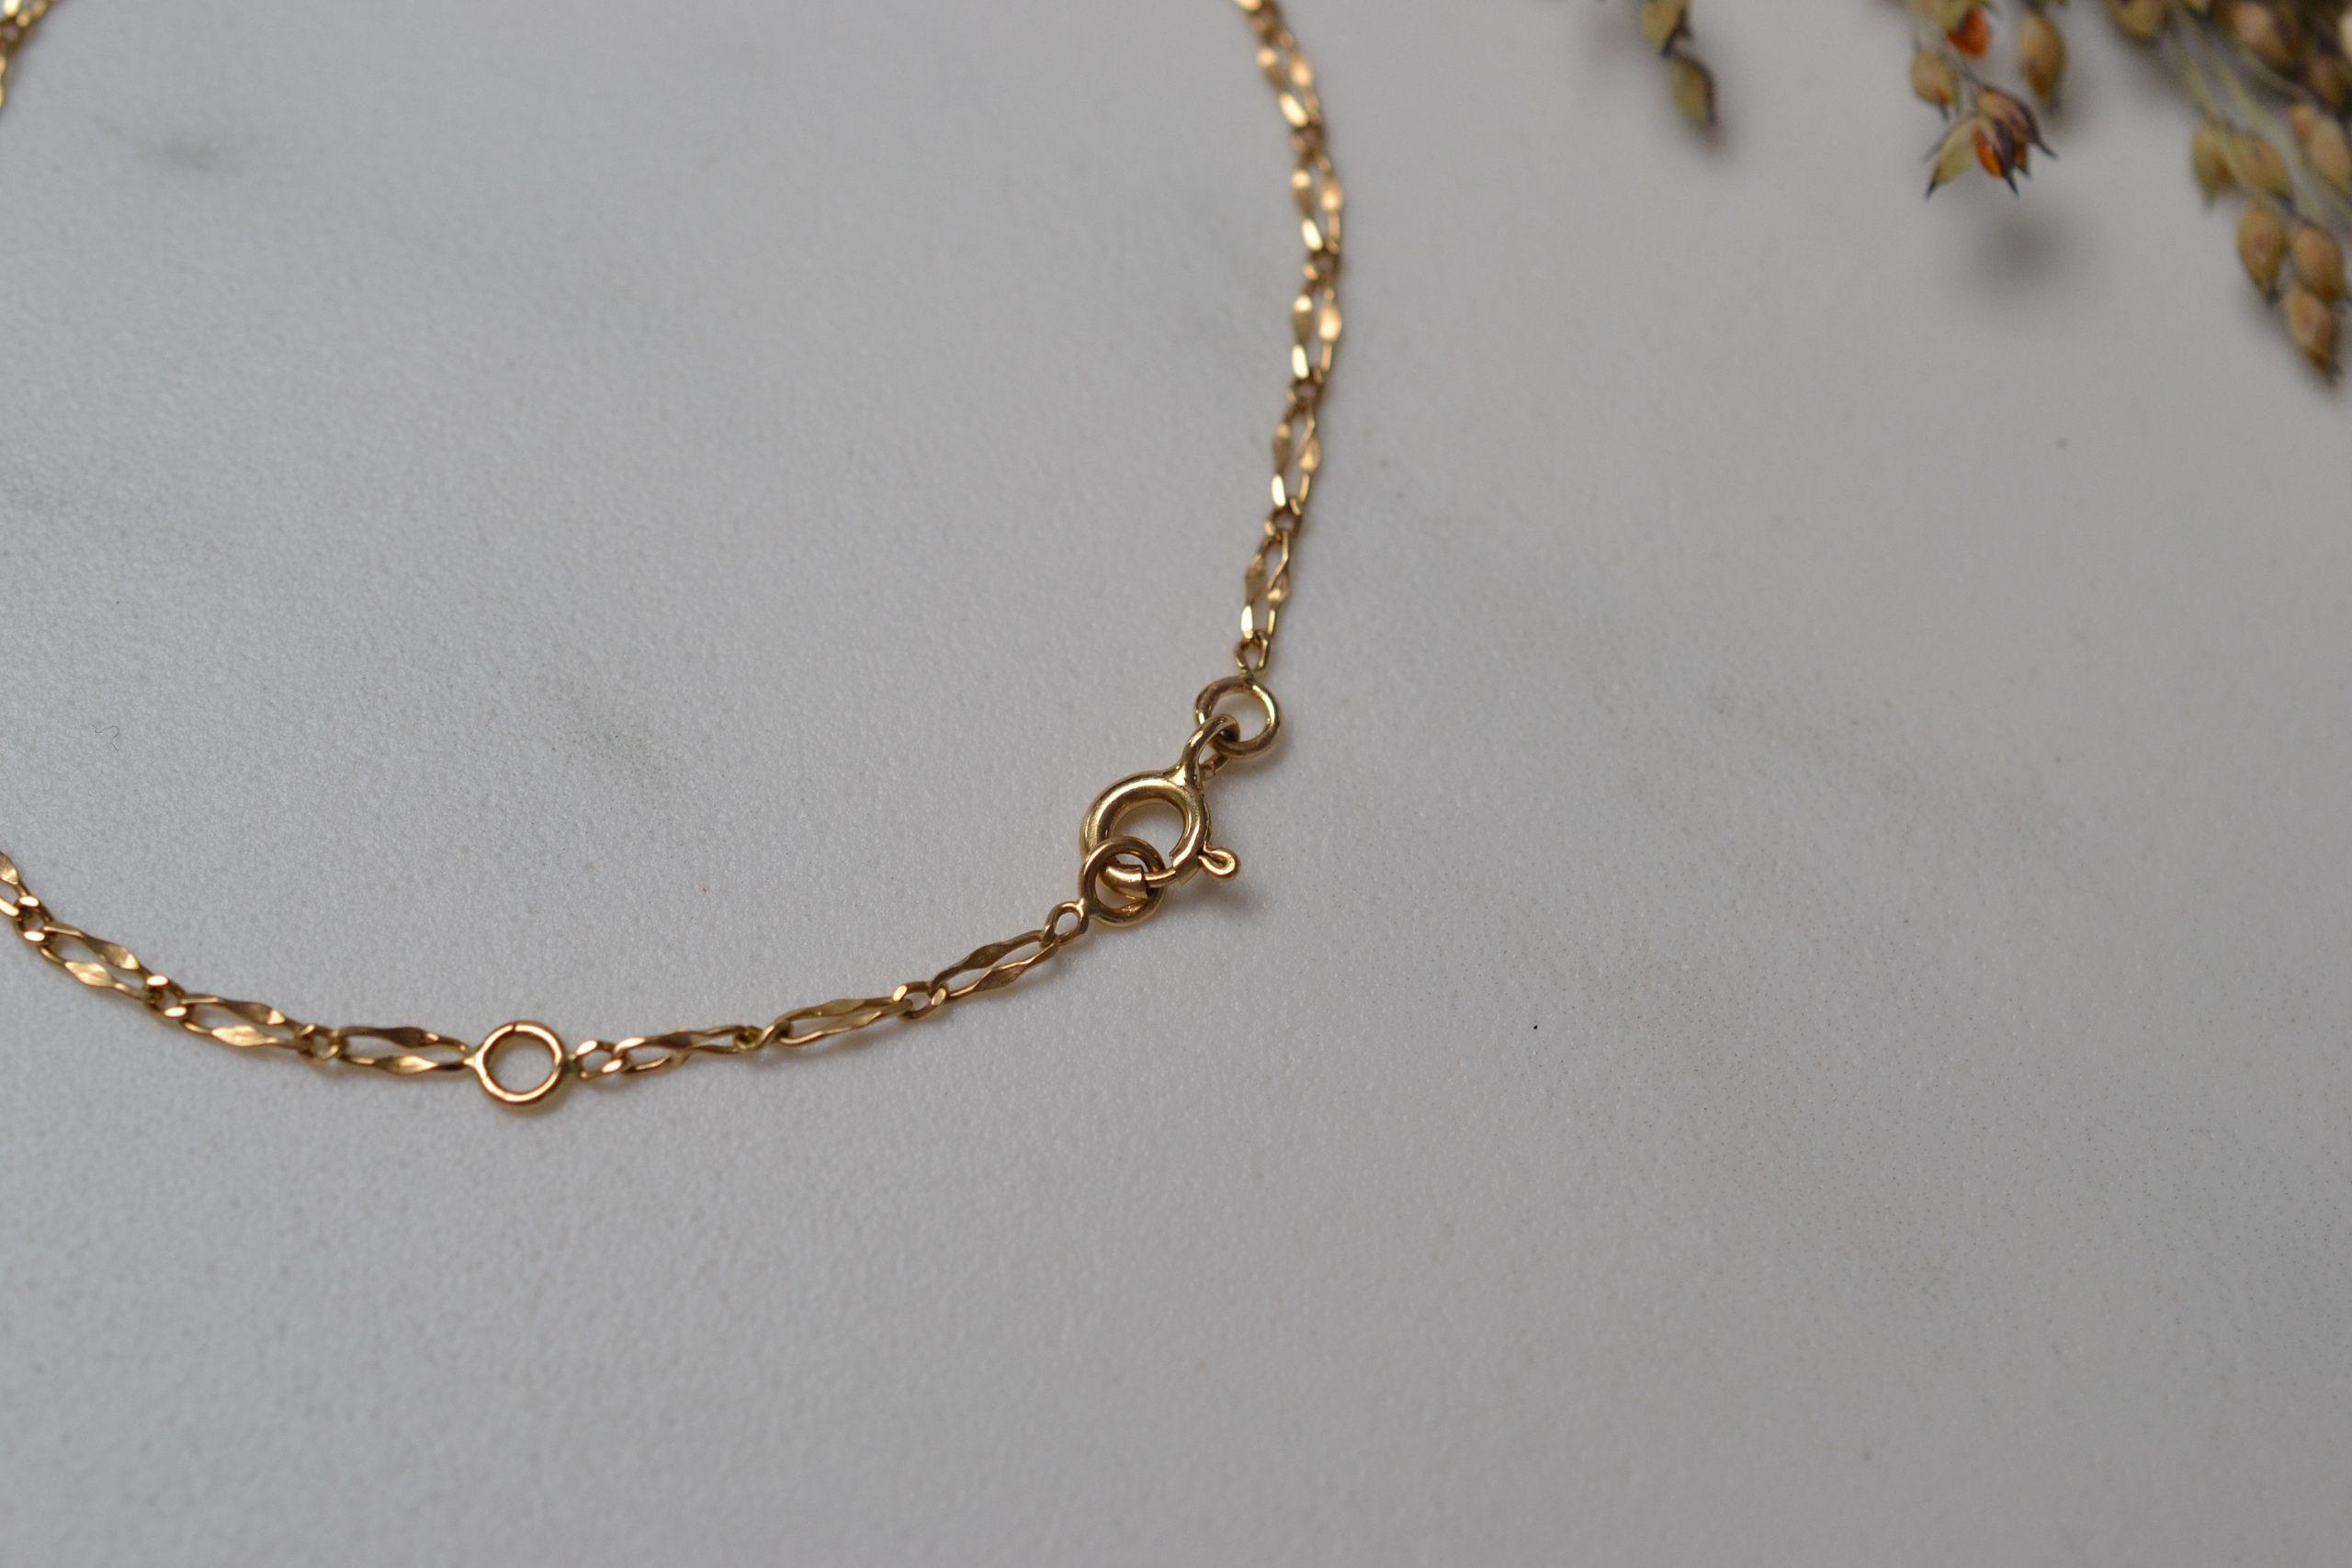 Fin bracelet en Or jaune, maille figaro alternee (1x1) et torsadee - bracelet de seconde main